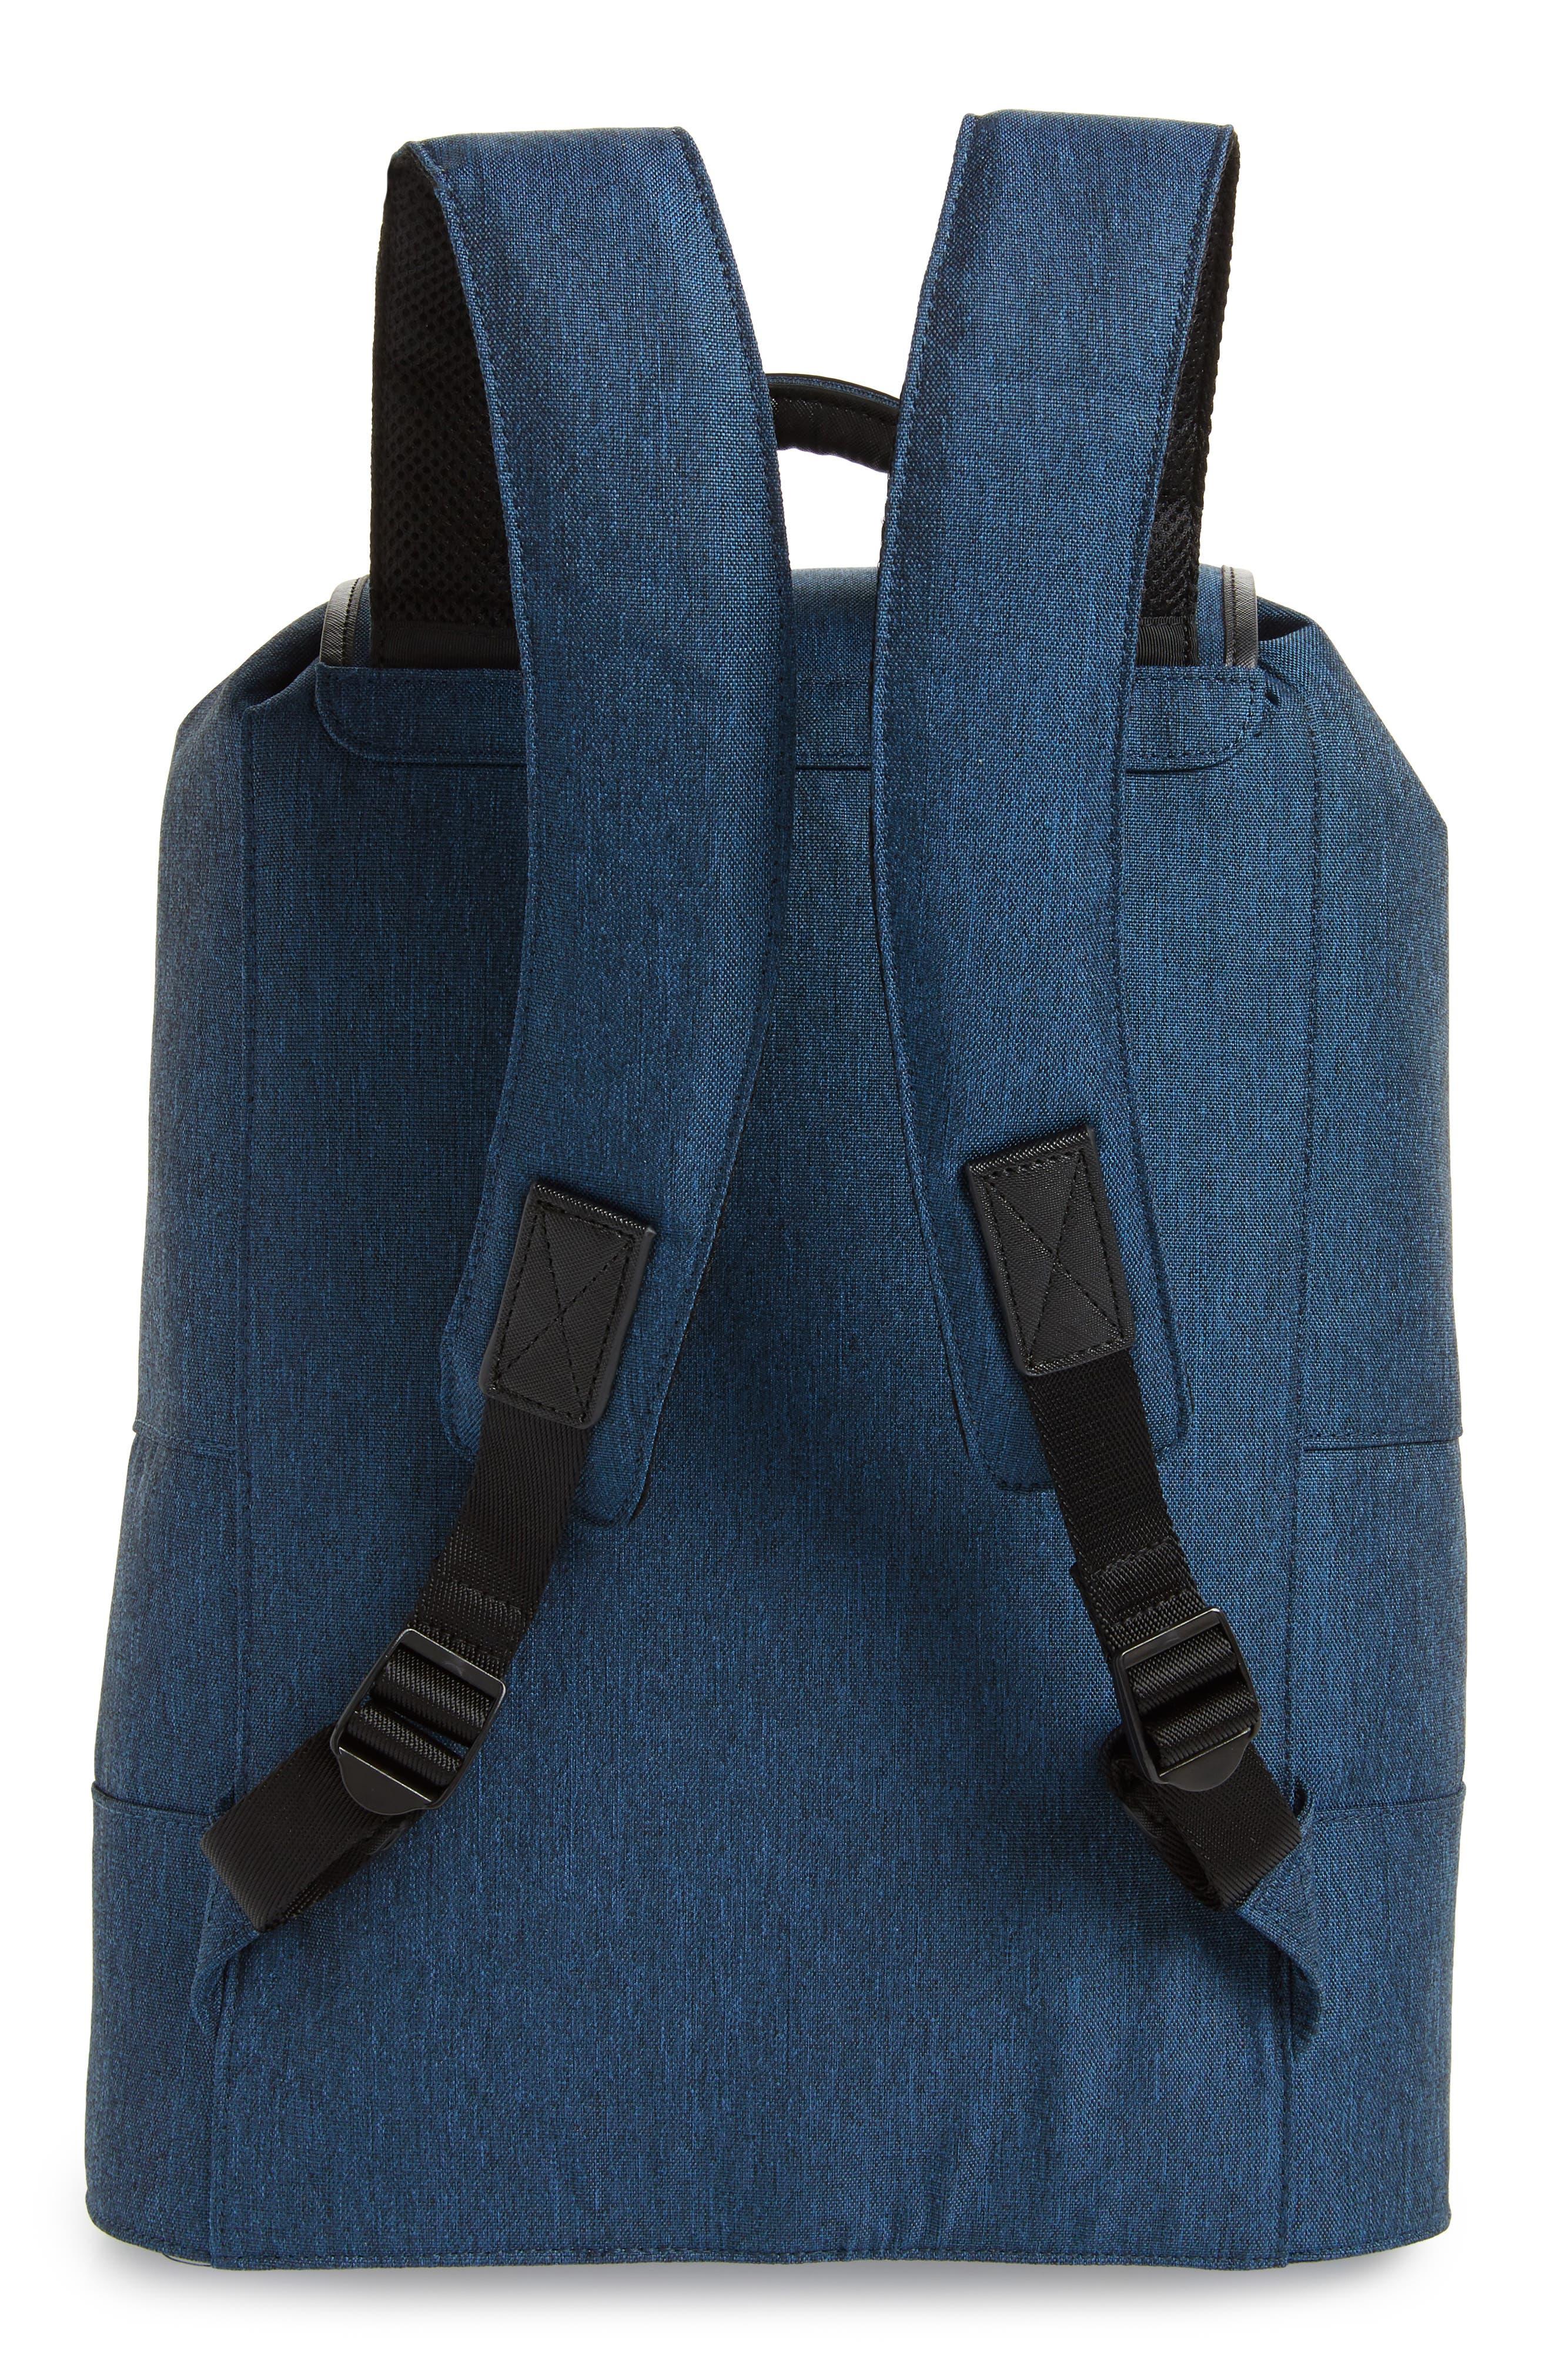 Rayman Backpack,                             Alternate thumbnail 3, color,                             Blue